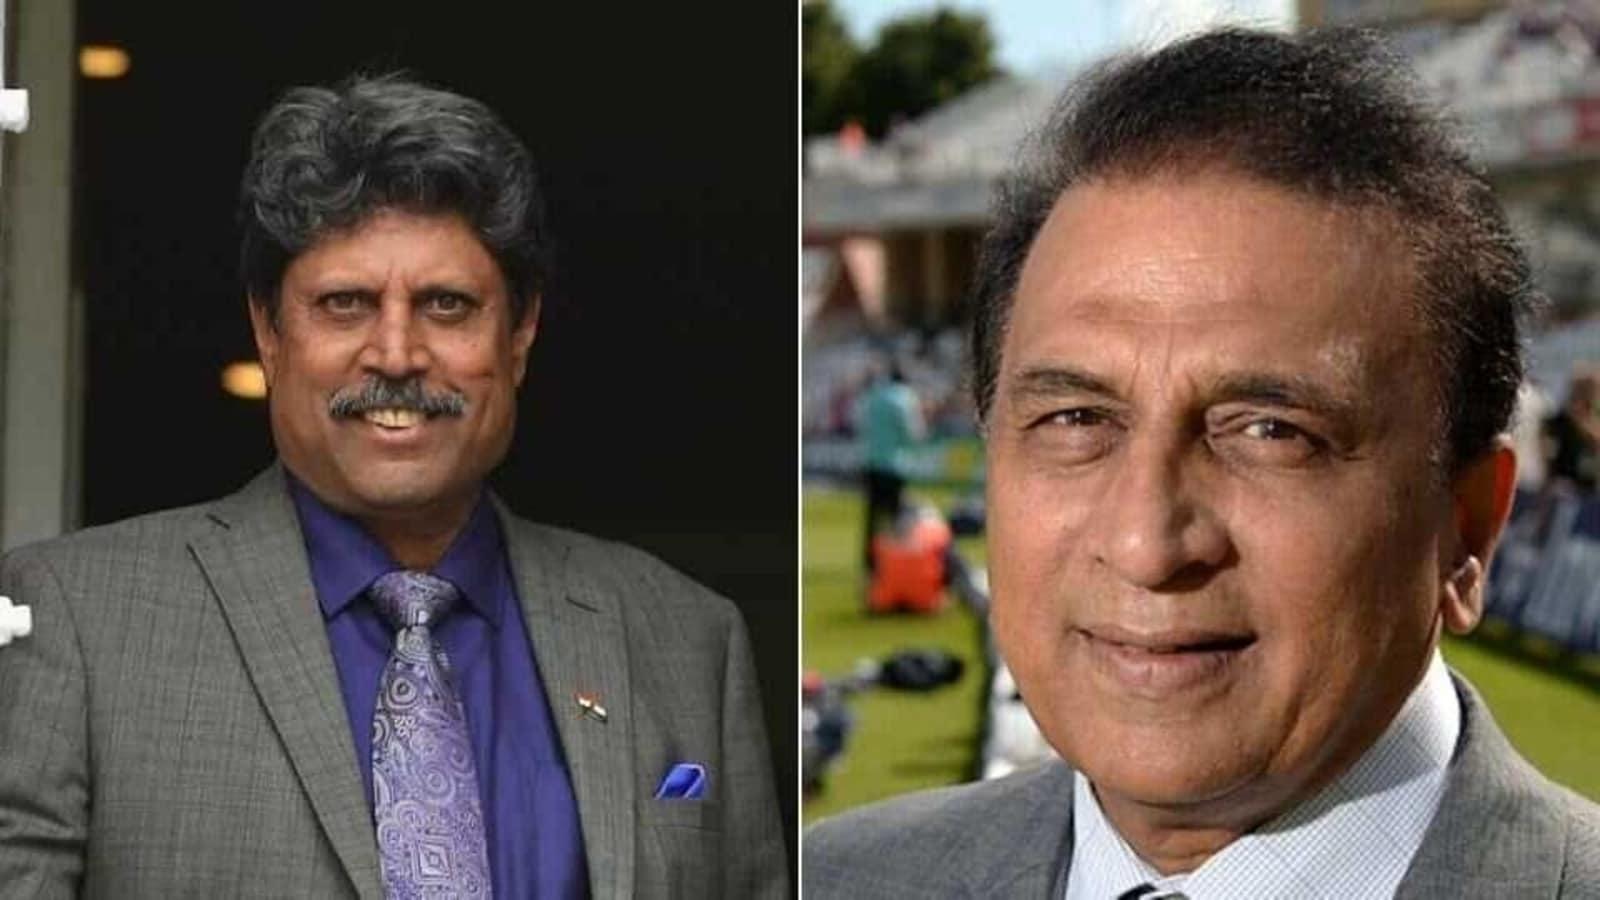 'Why would I drop my only match-winner?': Sunil Gavaskar on Kapil Dev being dropped from 1984 Kolkata Test - Hindustan Times